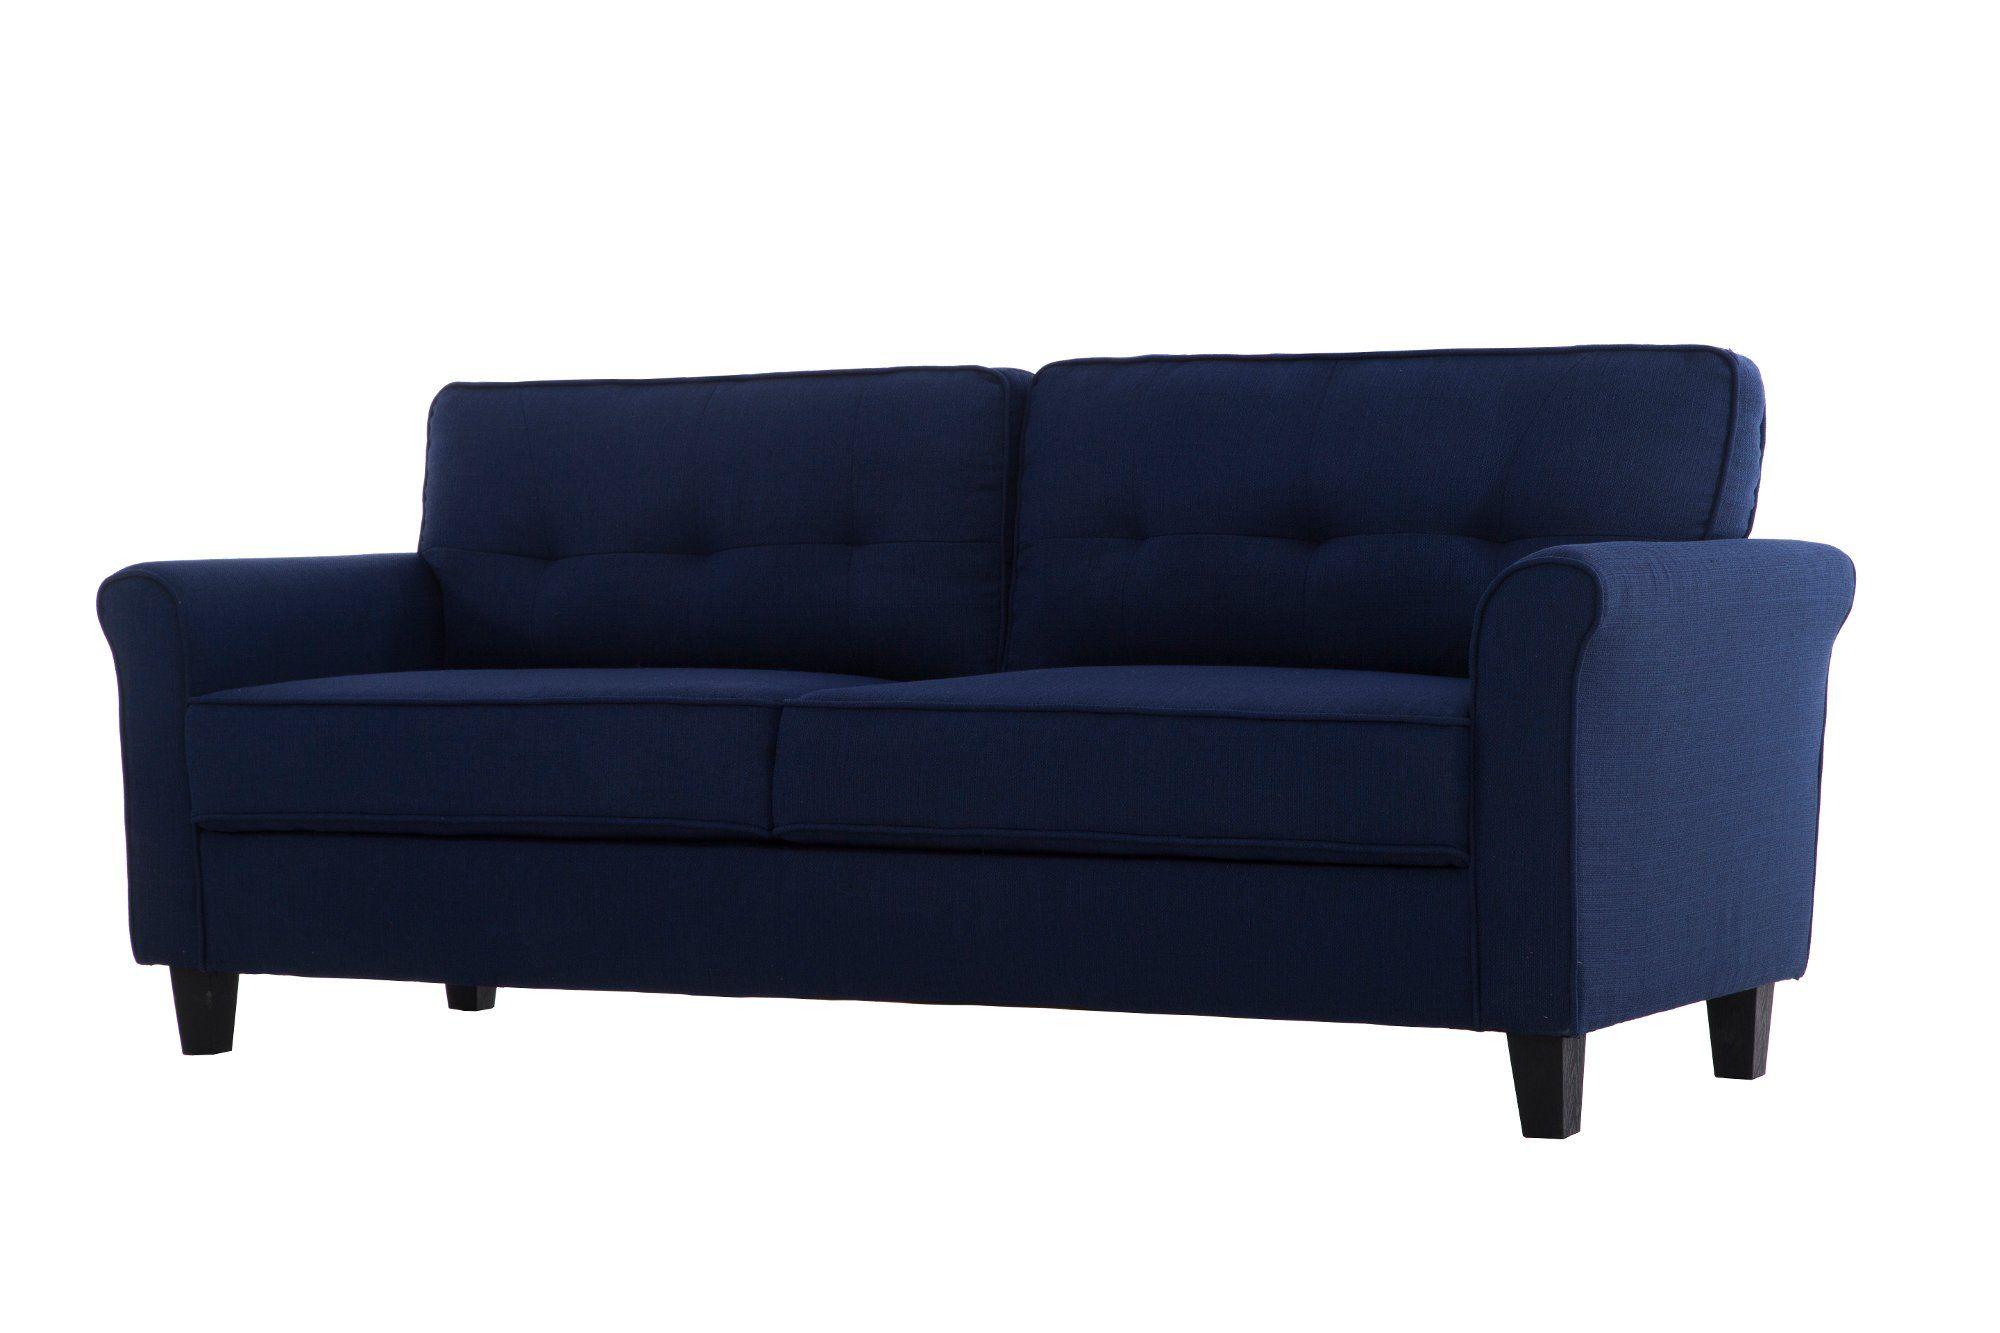 Classic Contemporary Navy Blue Loveseat Hanson Love Seat Blue